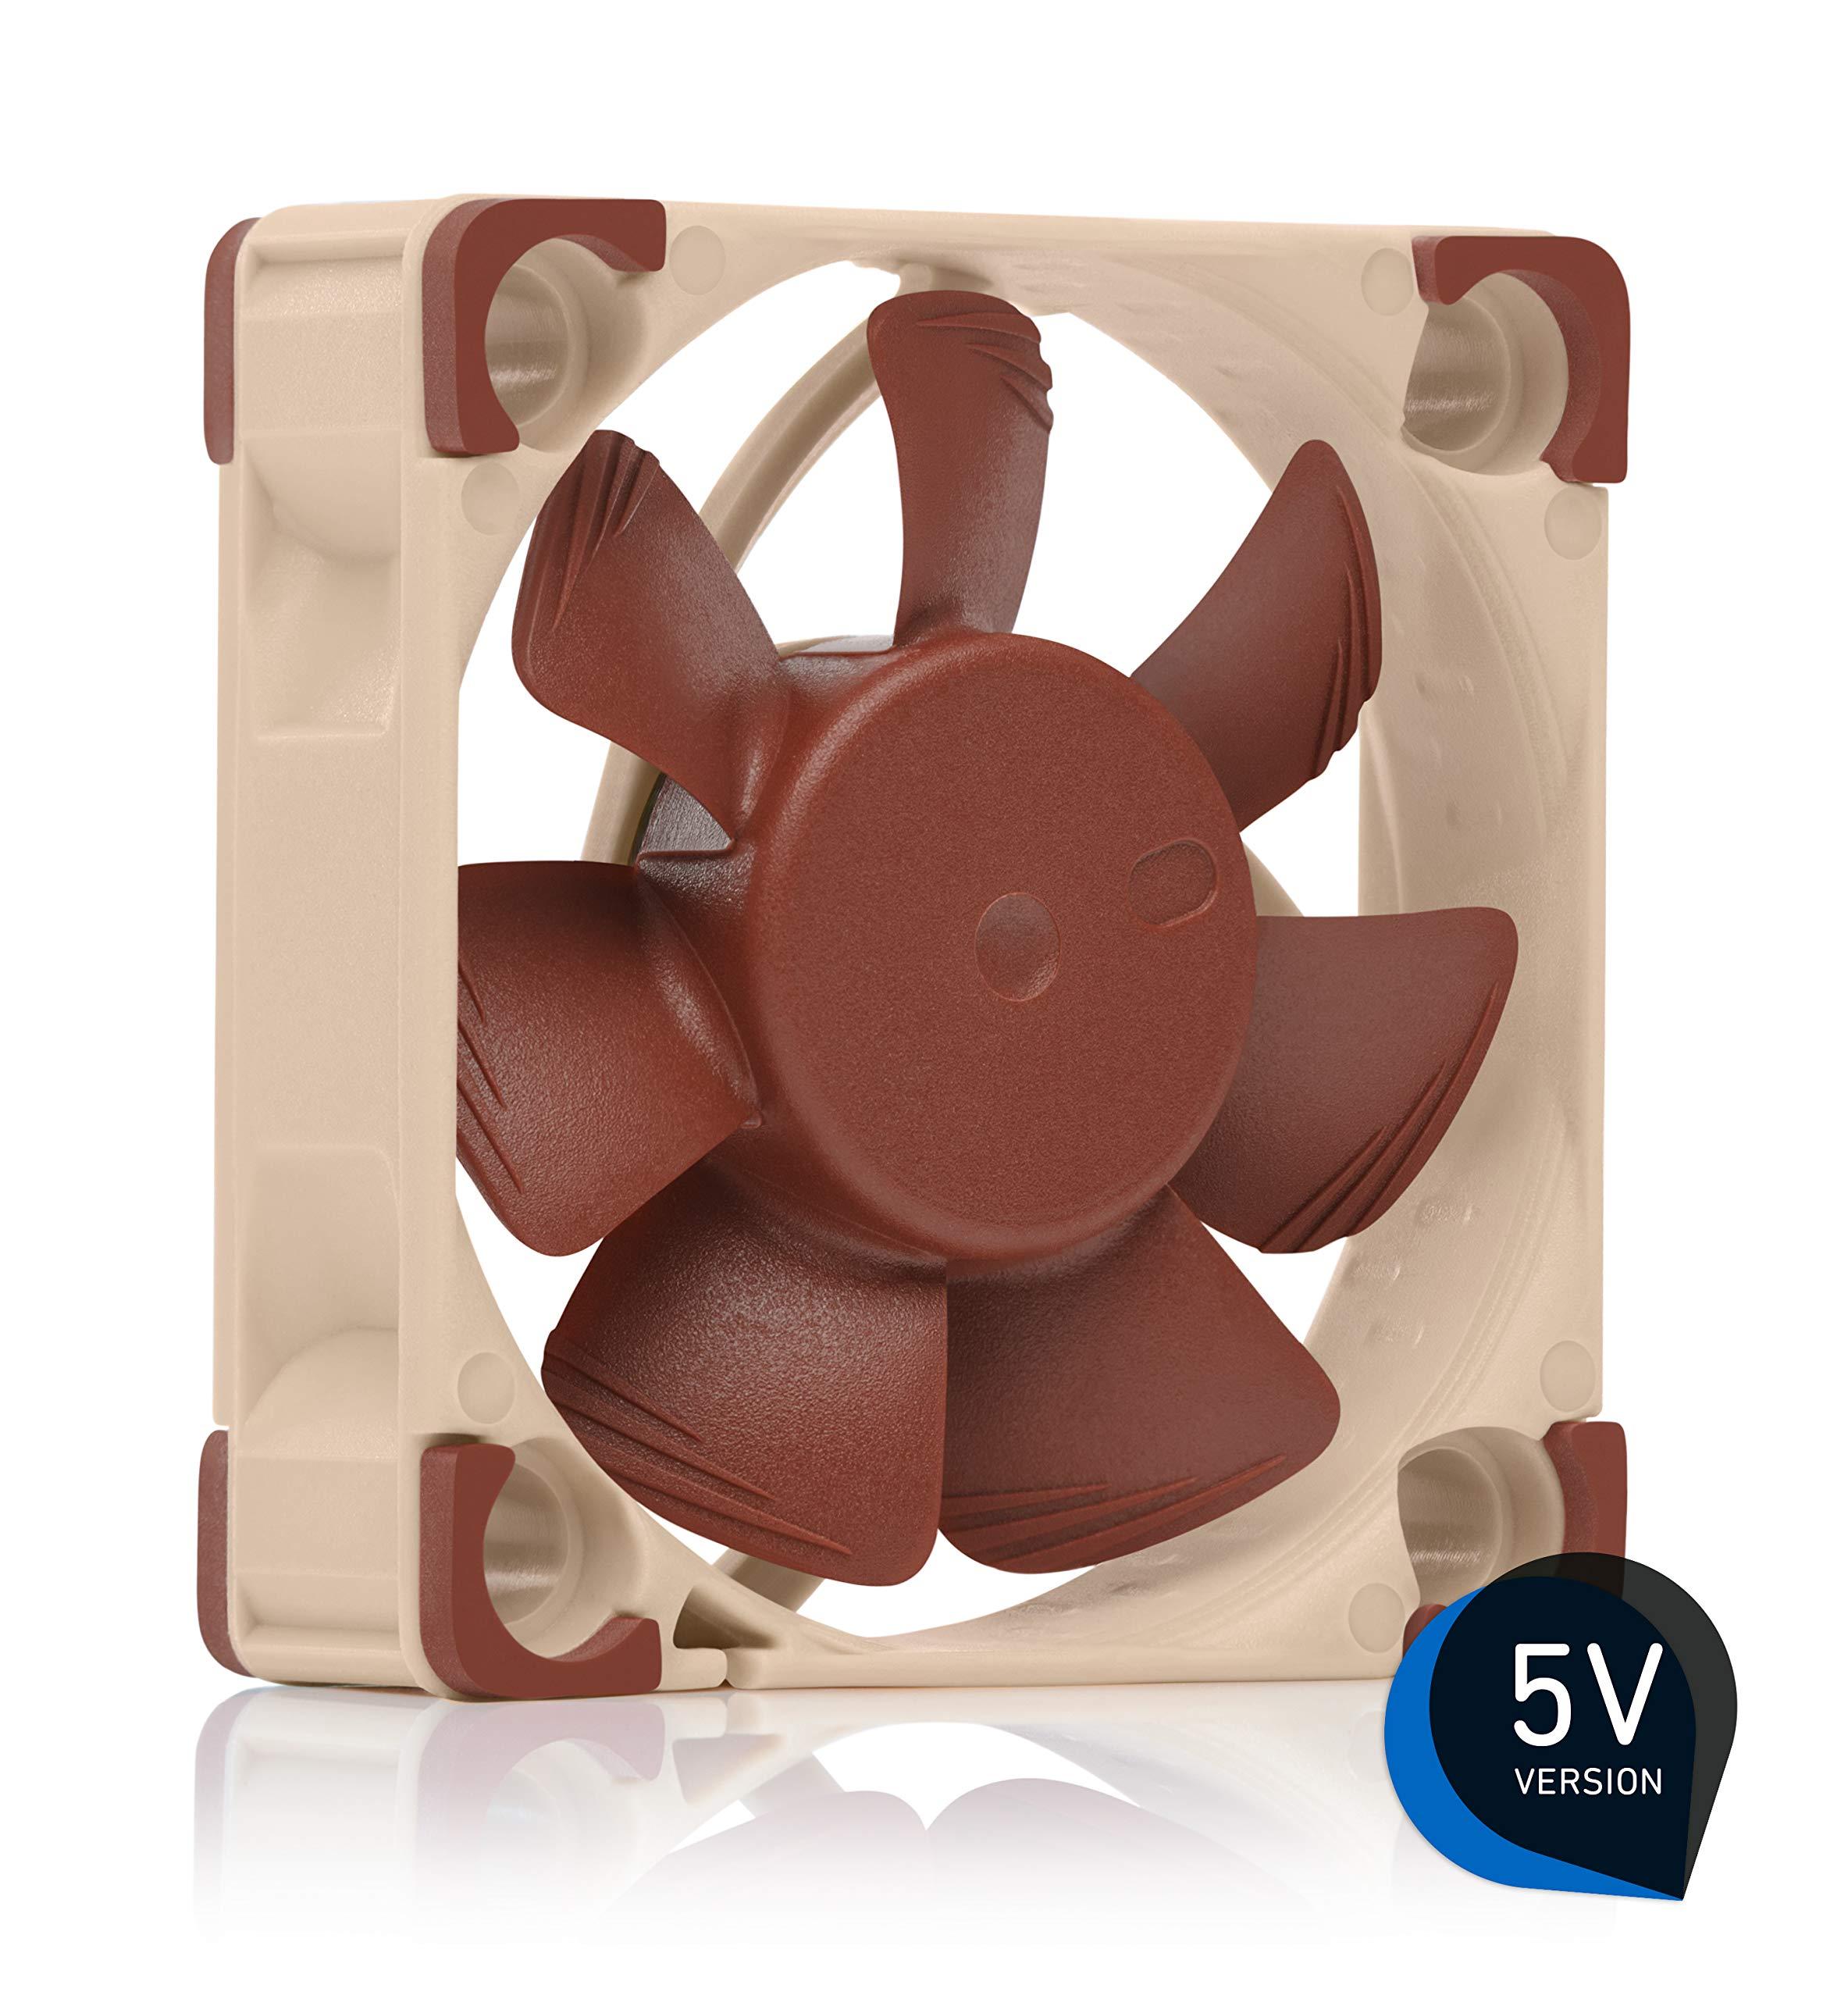 Noctua NF-A4x10 5V, Premium Quiet Fan, 3-Pin, 5V Version (40x10mm, Brown) by NOCTUA